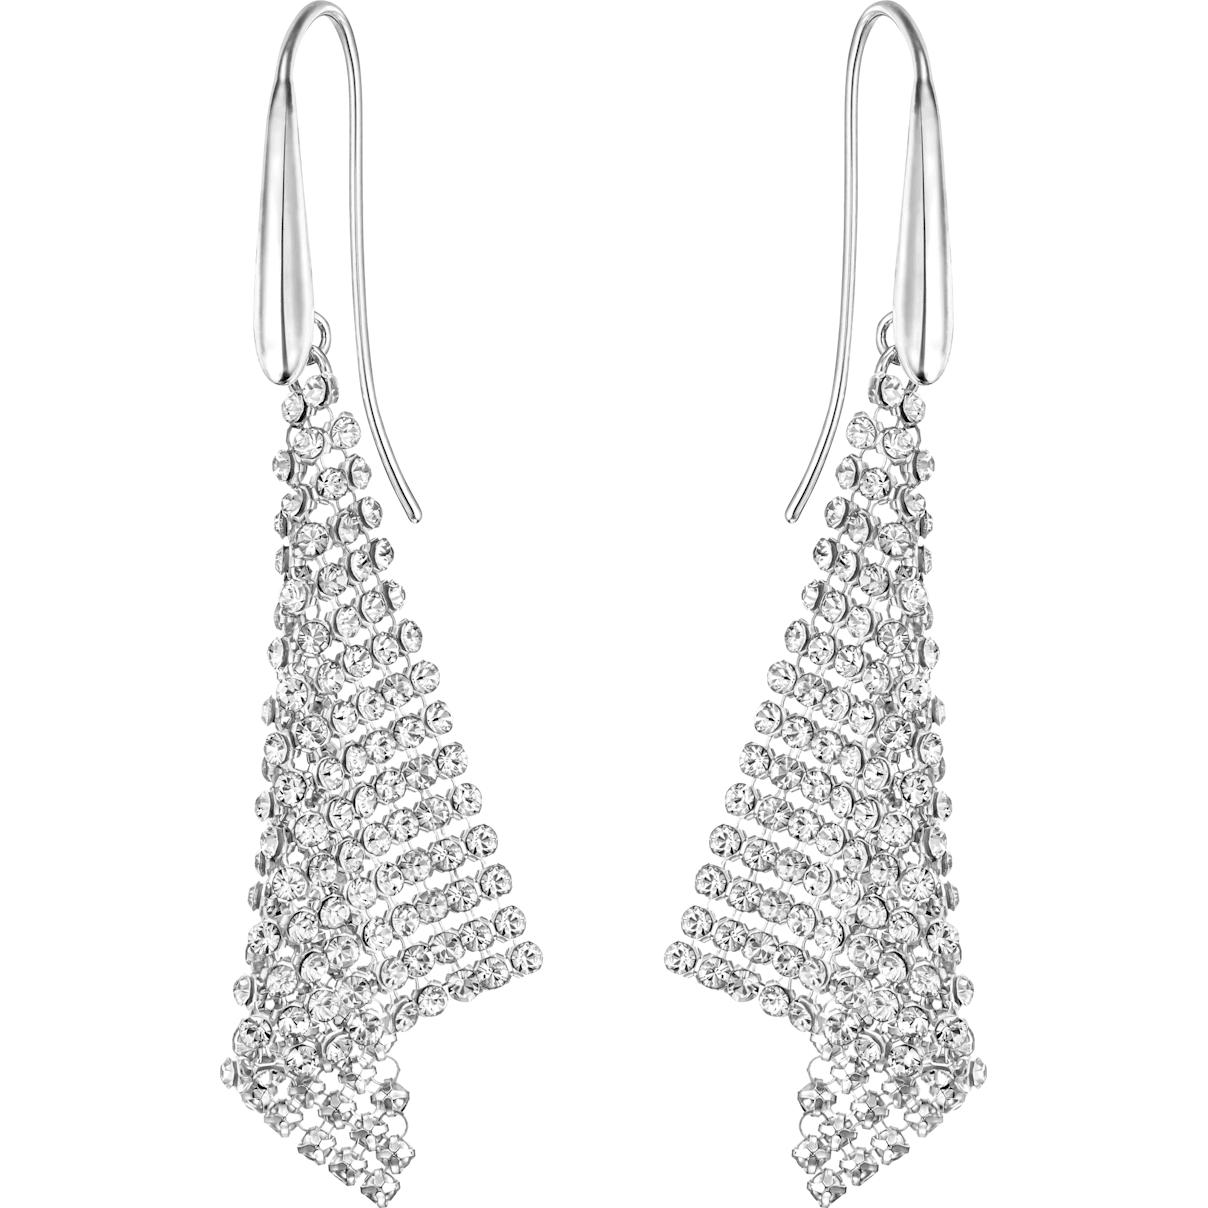 Swarovski Fit Pierced Earrings, White, Rhodium plated